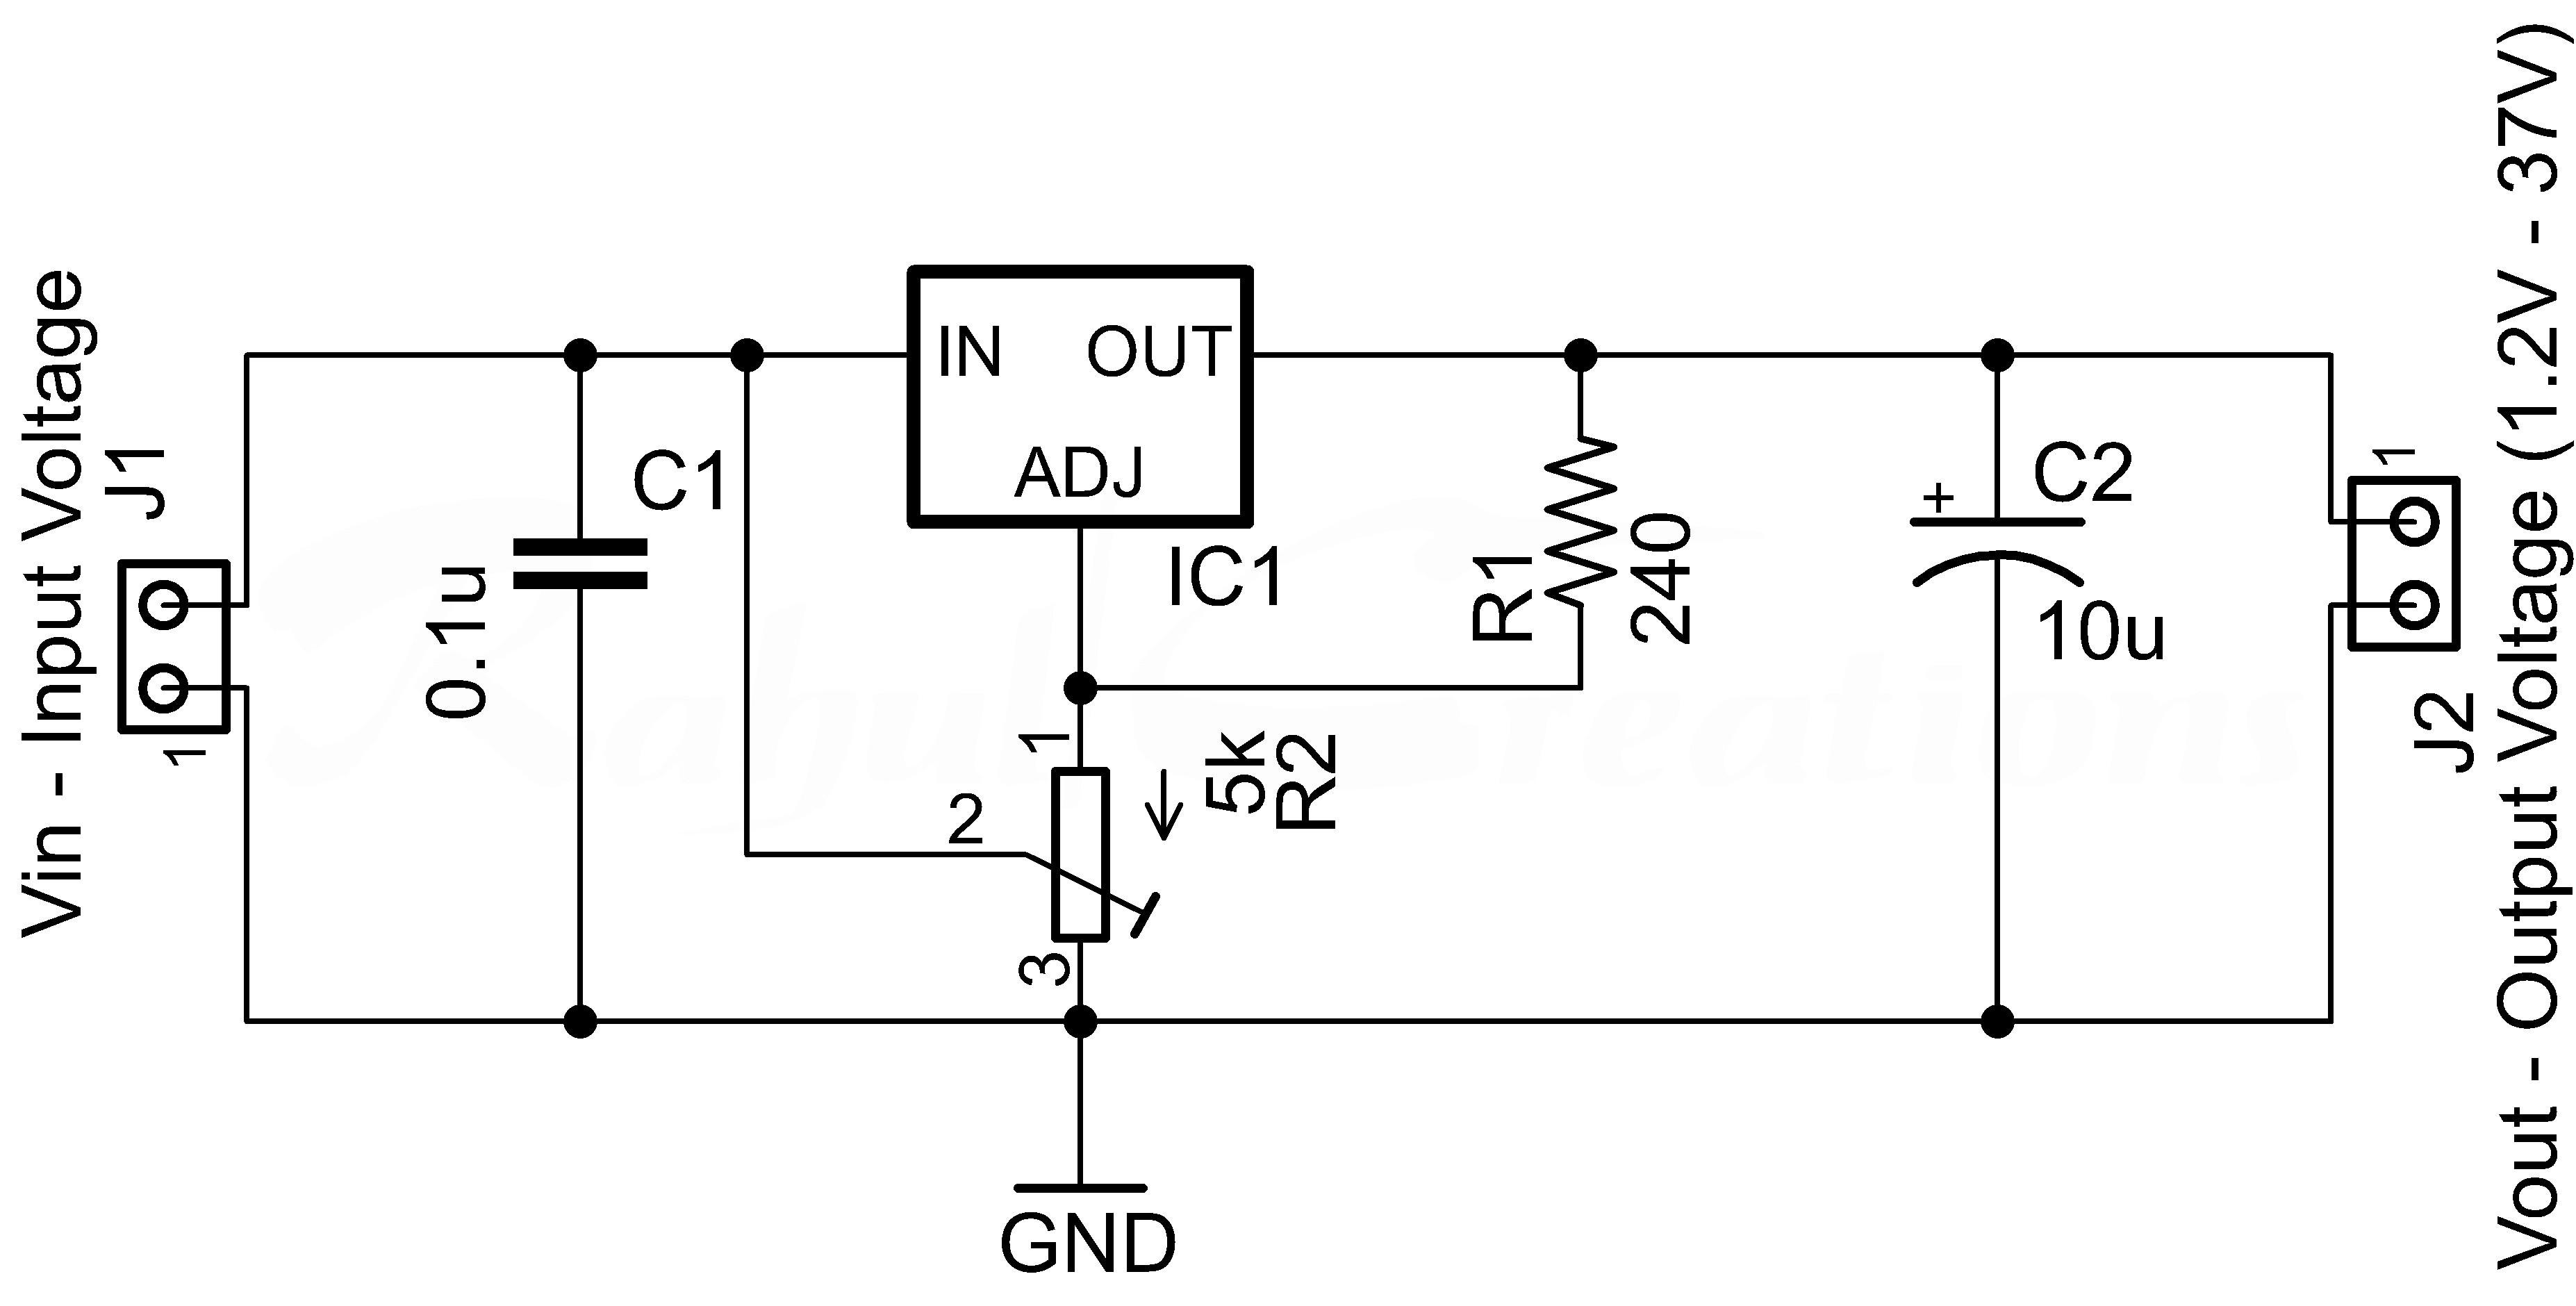 Led Circuit Diagram Inspirational Wonderful Efy Circuits Diagrams Electrical Circuit